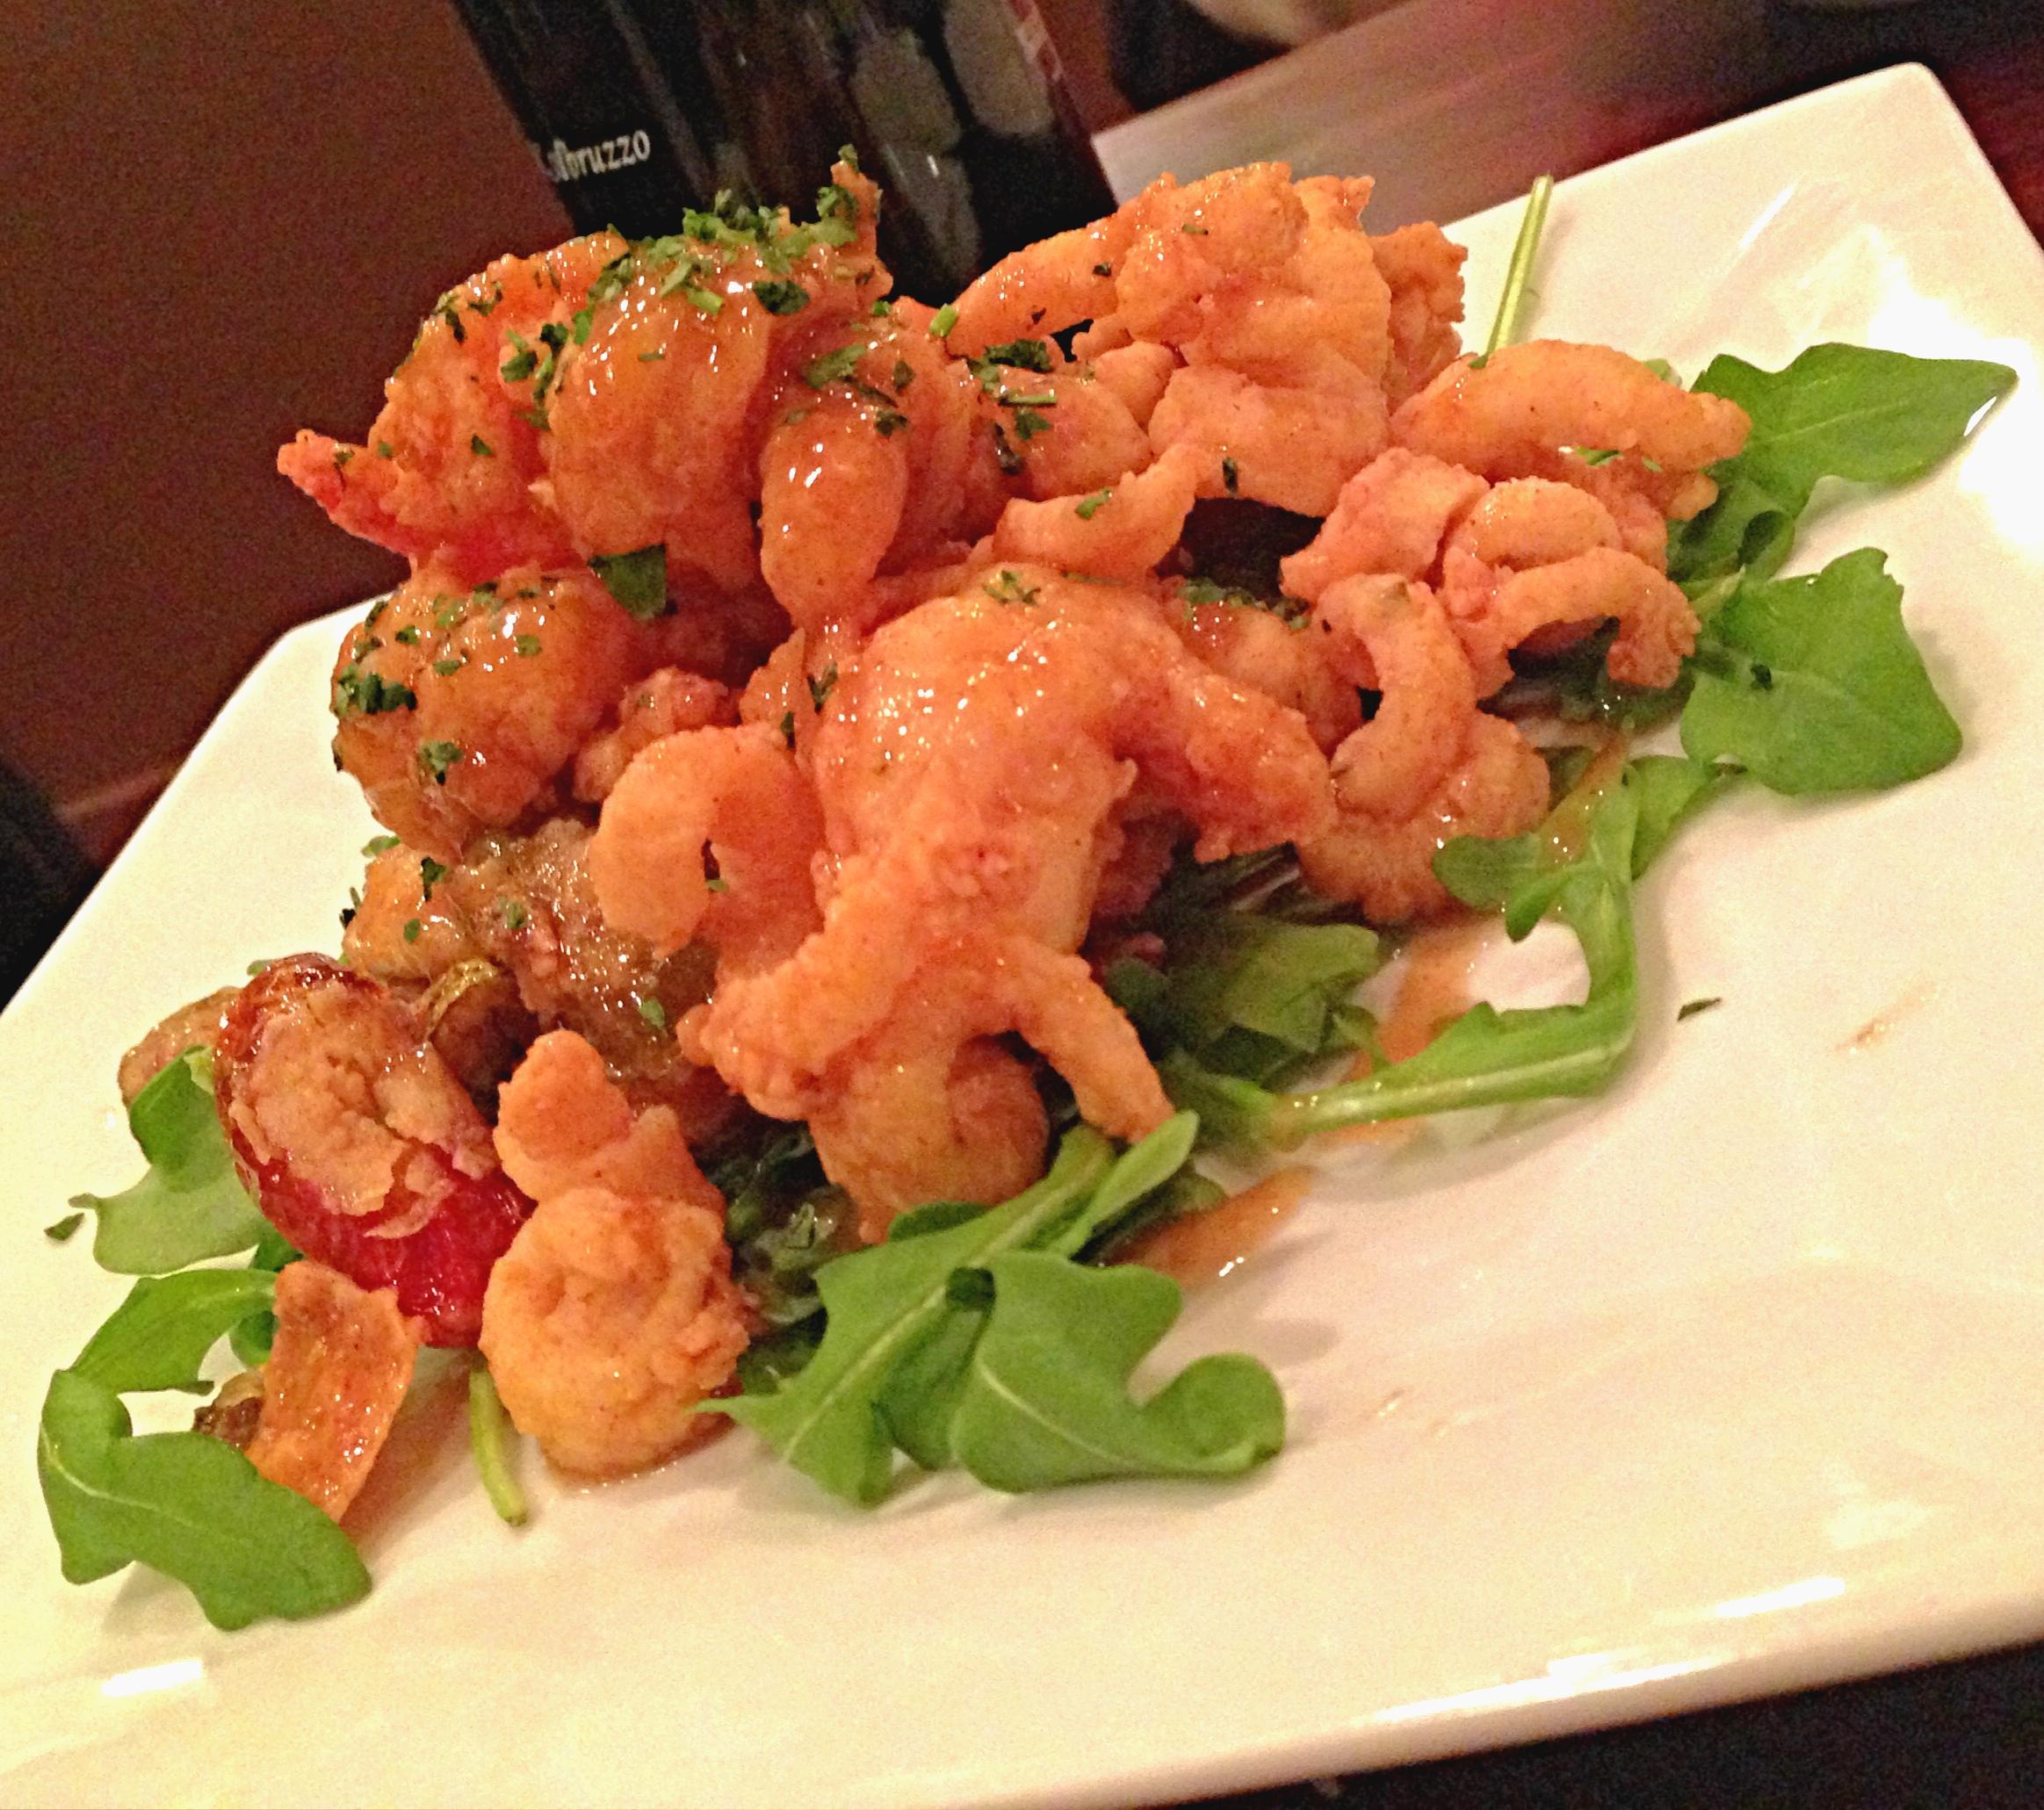 Calamari and shrimp in mustard sauce